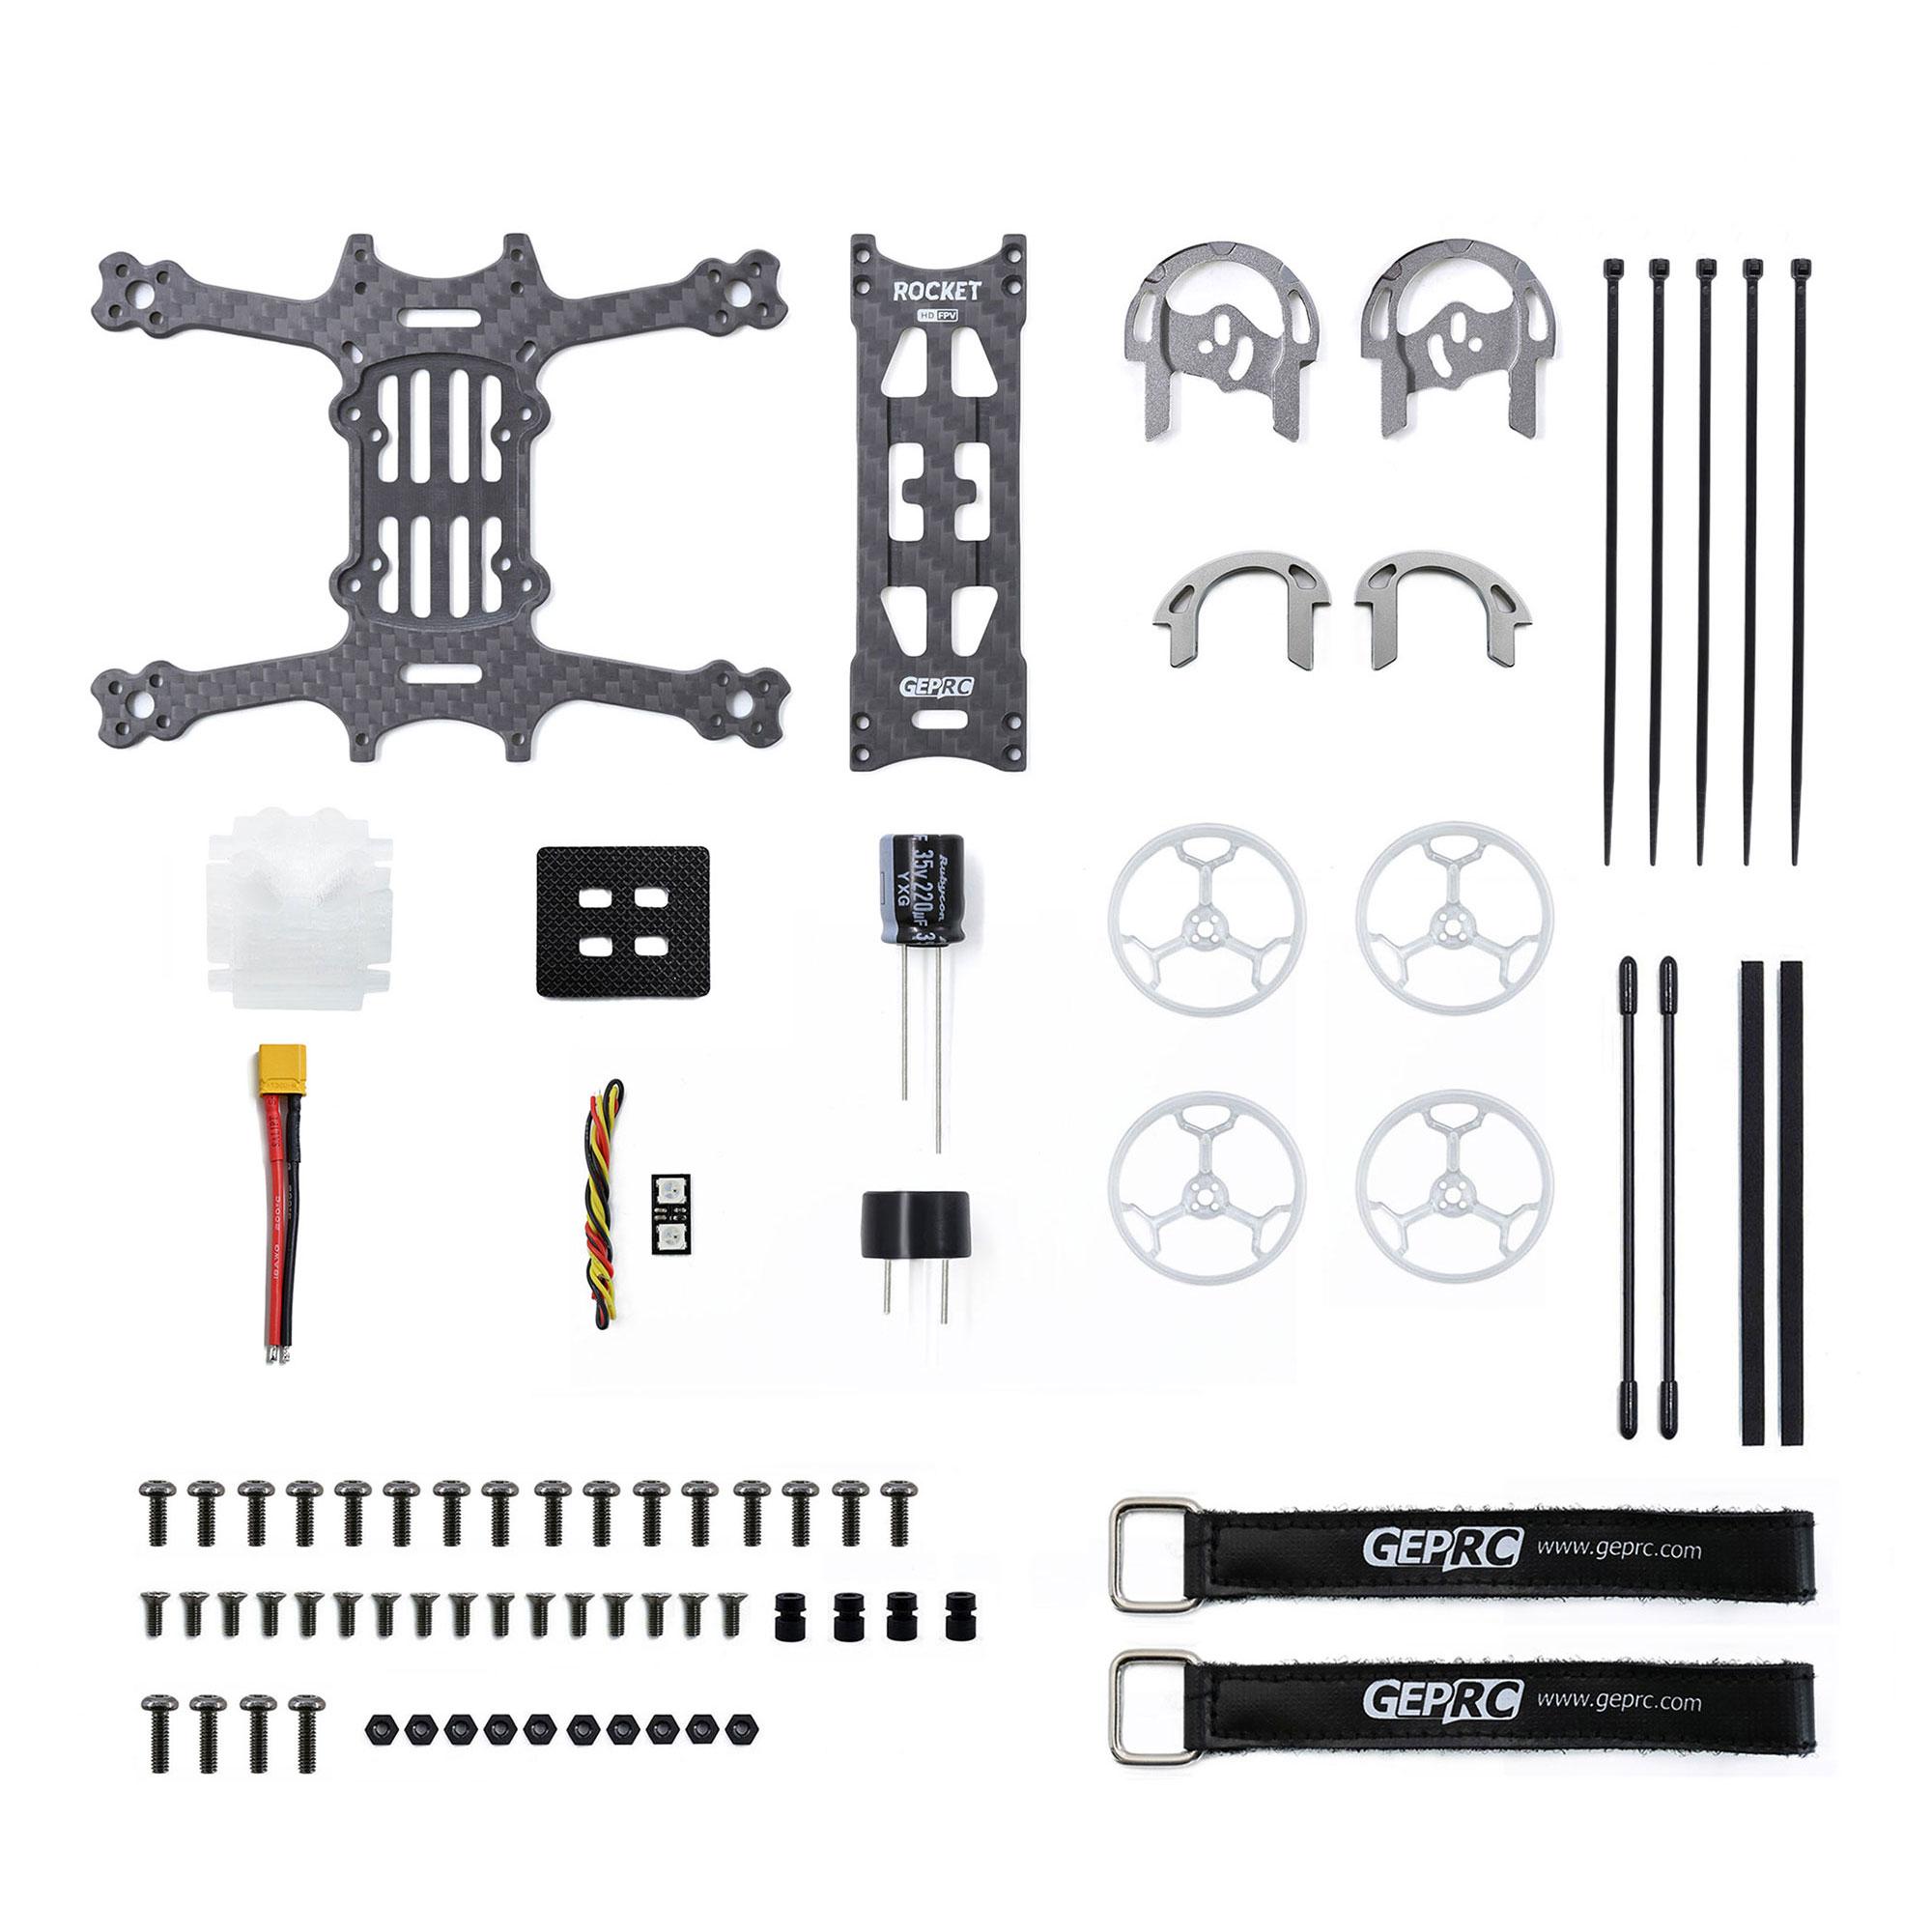 GEPRC GEP-RP RL Frame Parts